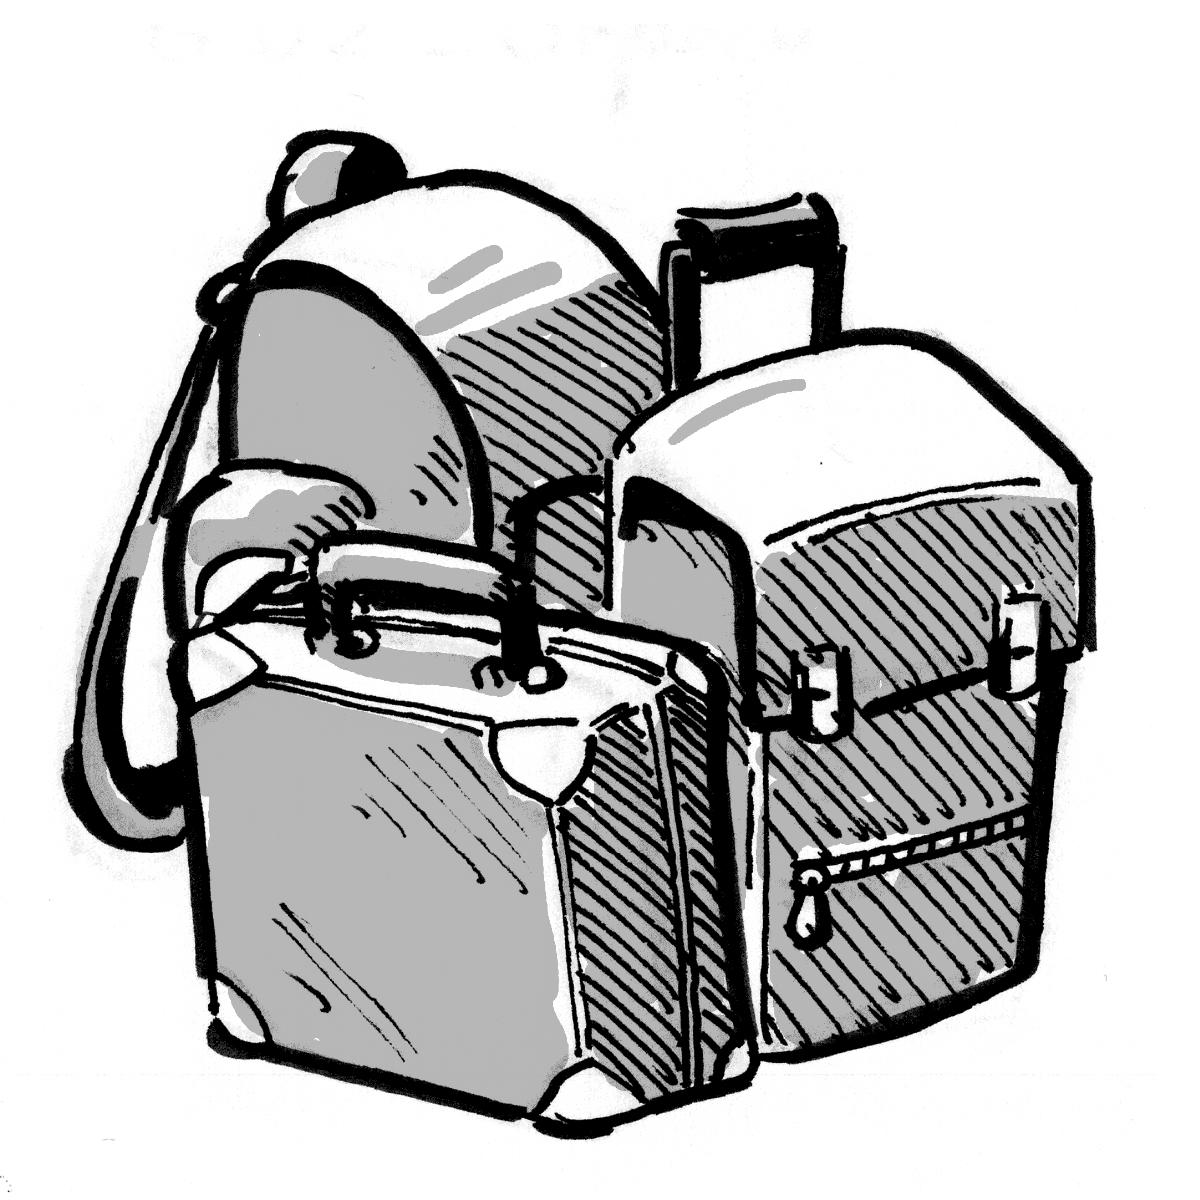 G02-Gepäck-suitcases-luggage.jpg